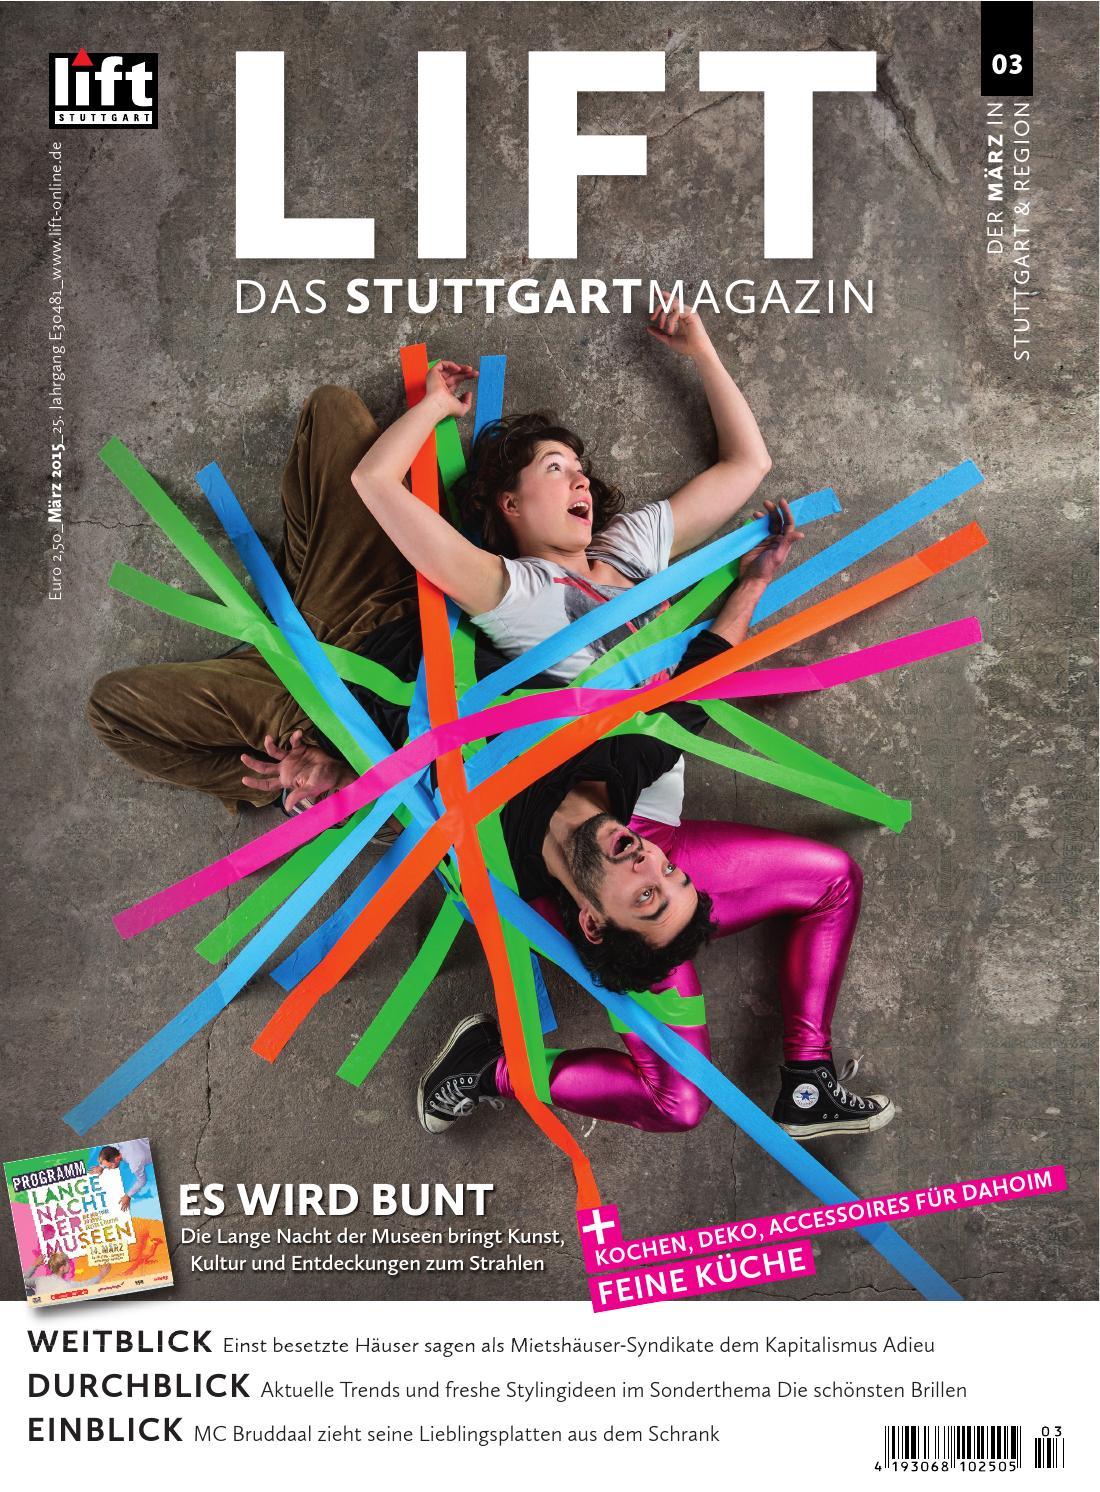 LIFT Stuttgart - Leseprobe März 2015 by LIFT Das Stuttgartmagazin ...